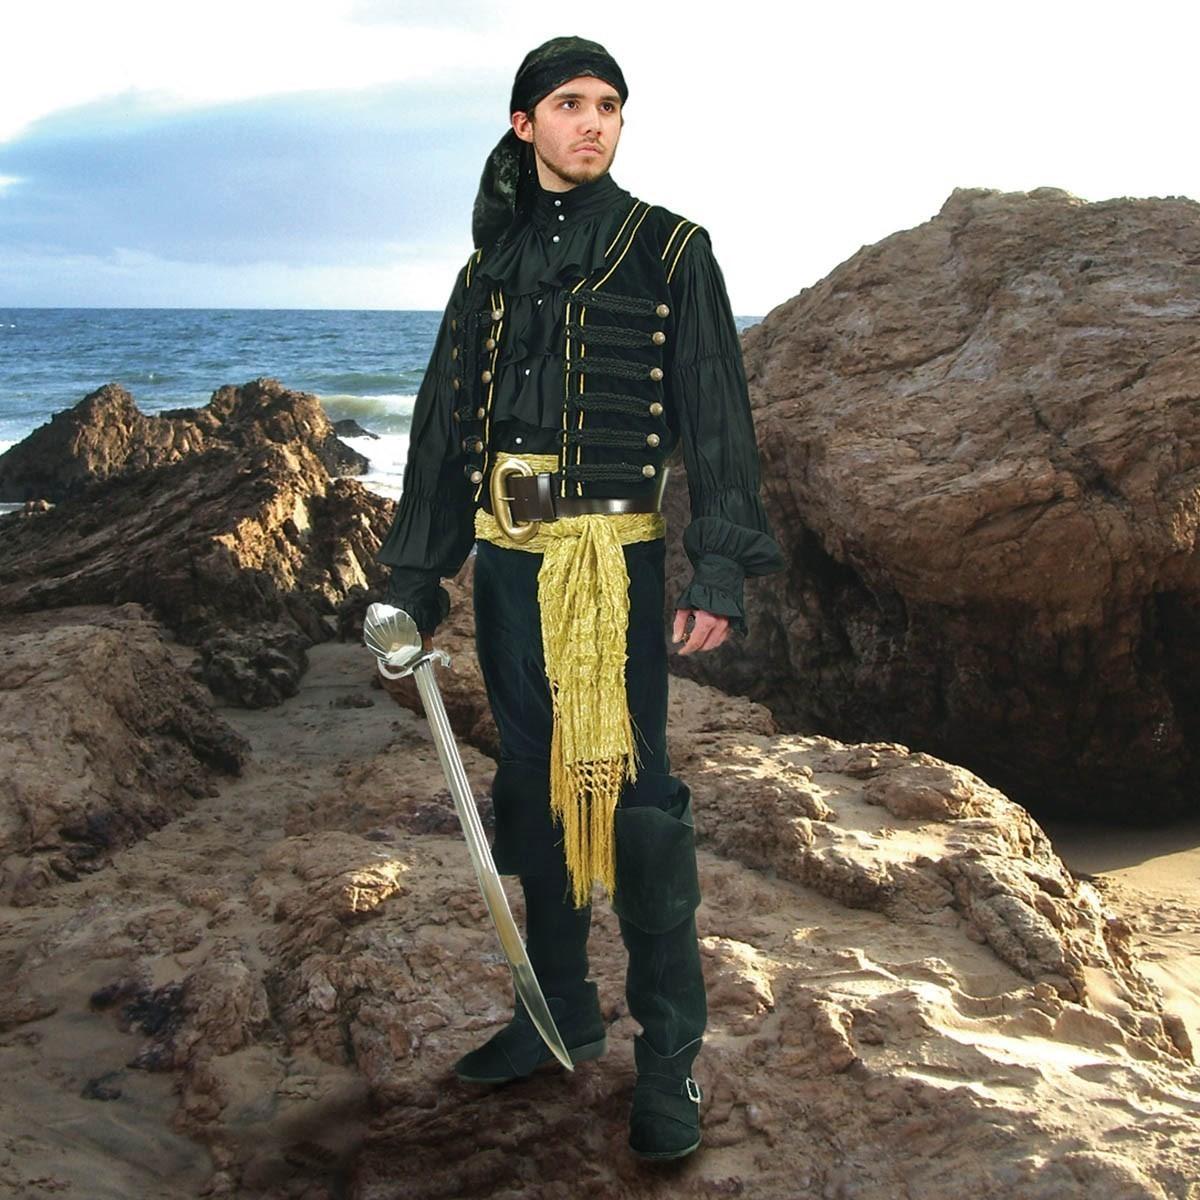 Pirate or Gypsy Gold Tasseled Sash